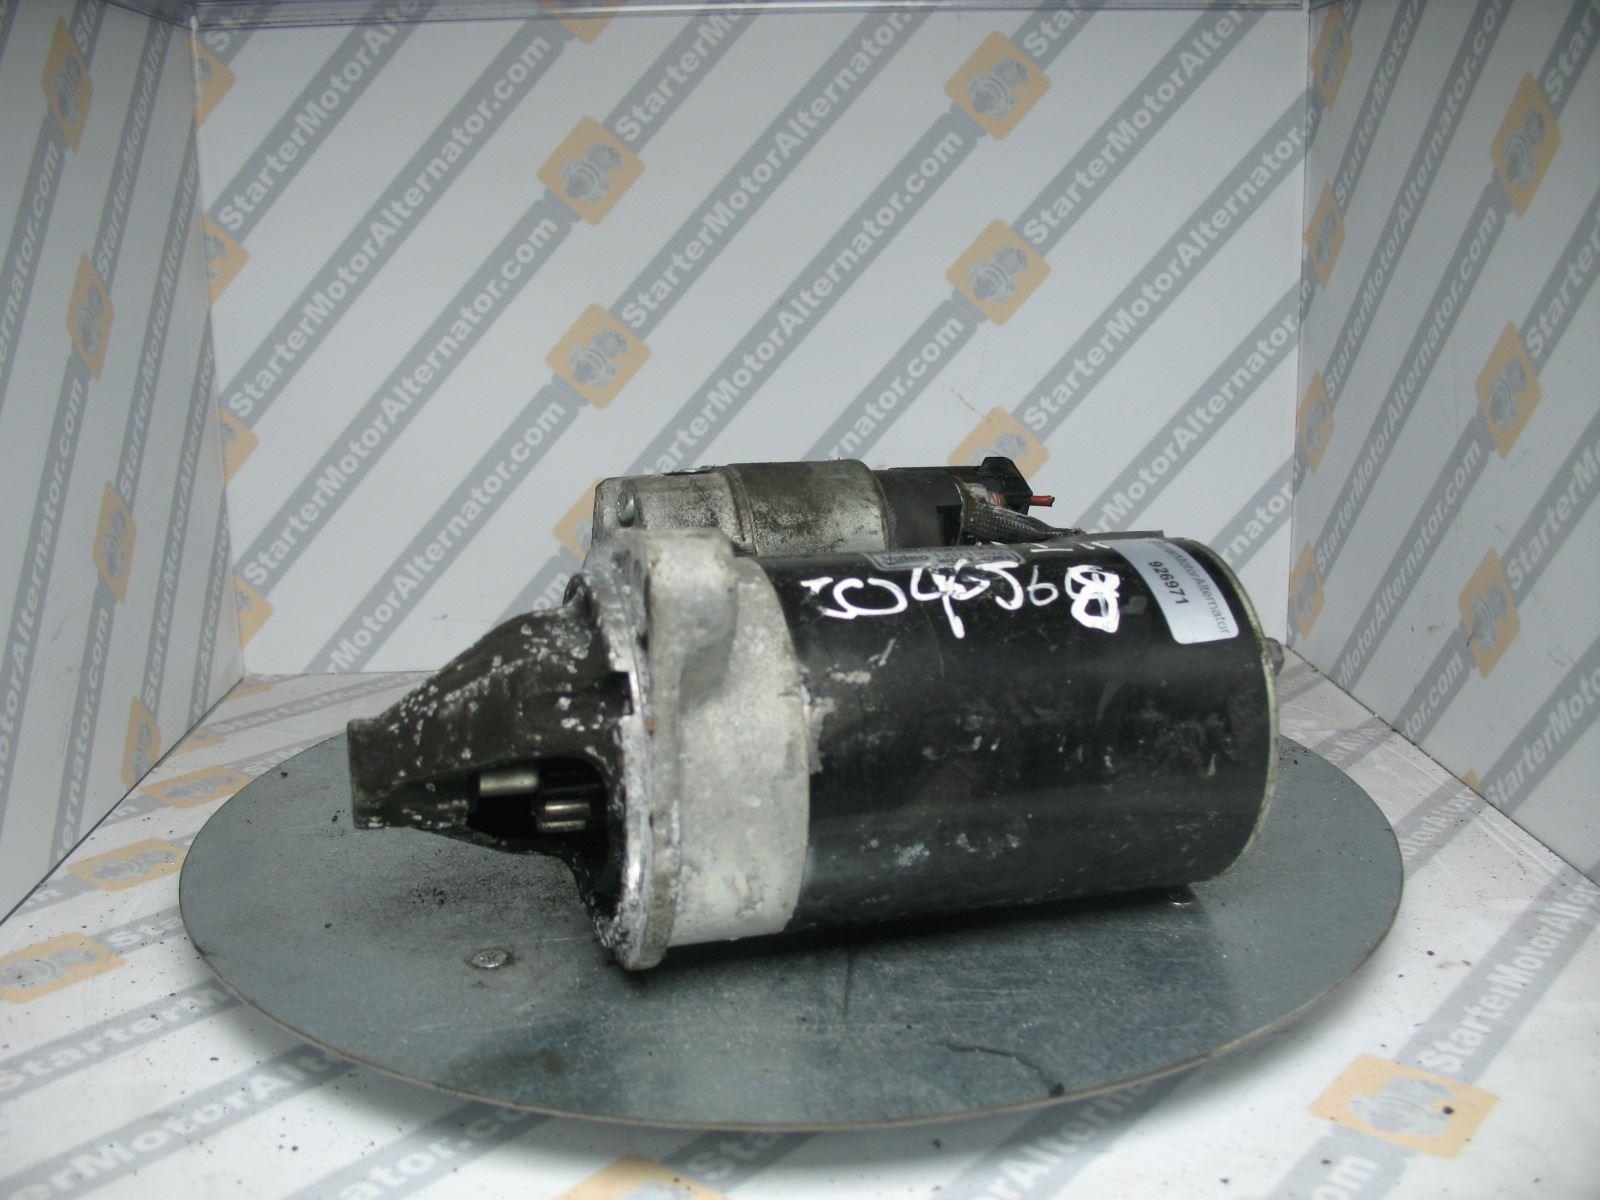 XIY3899 Starter Motor For Hyundai / Kia